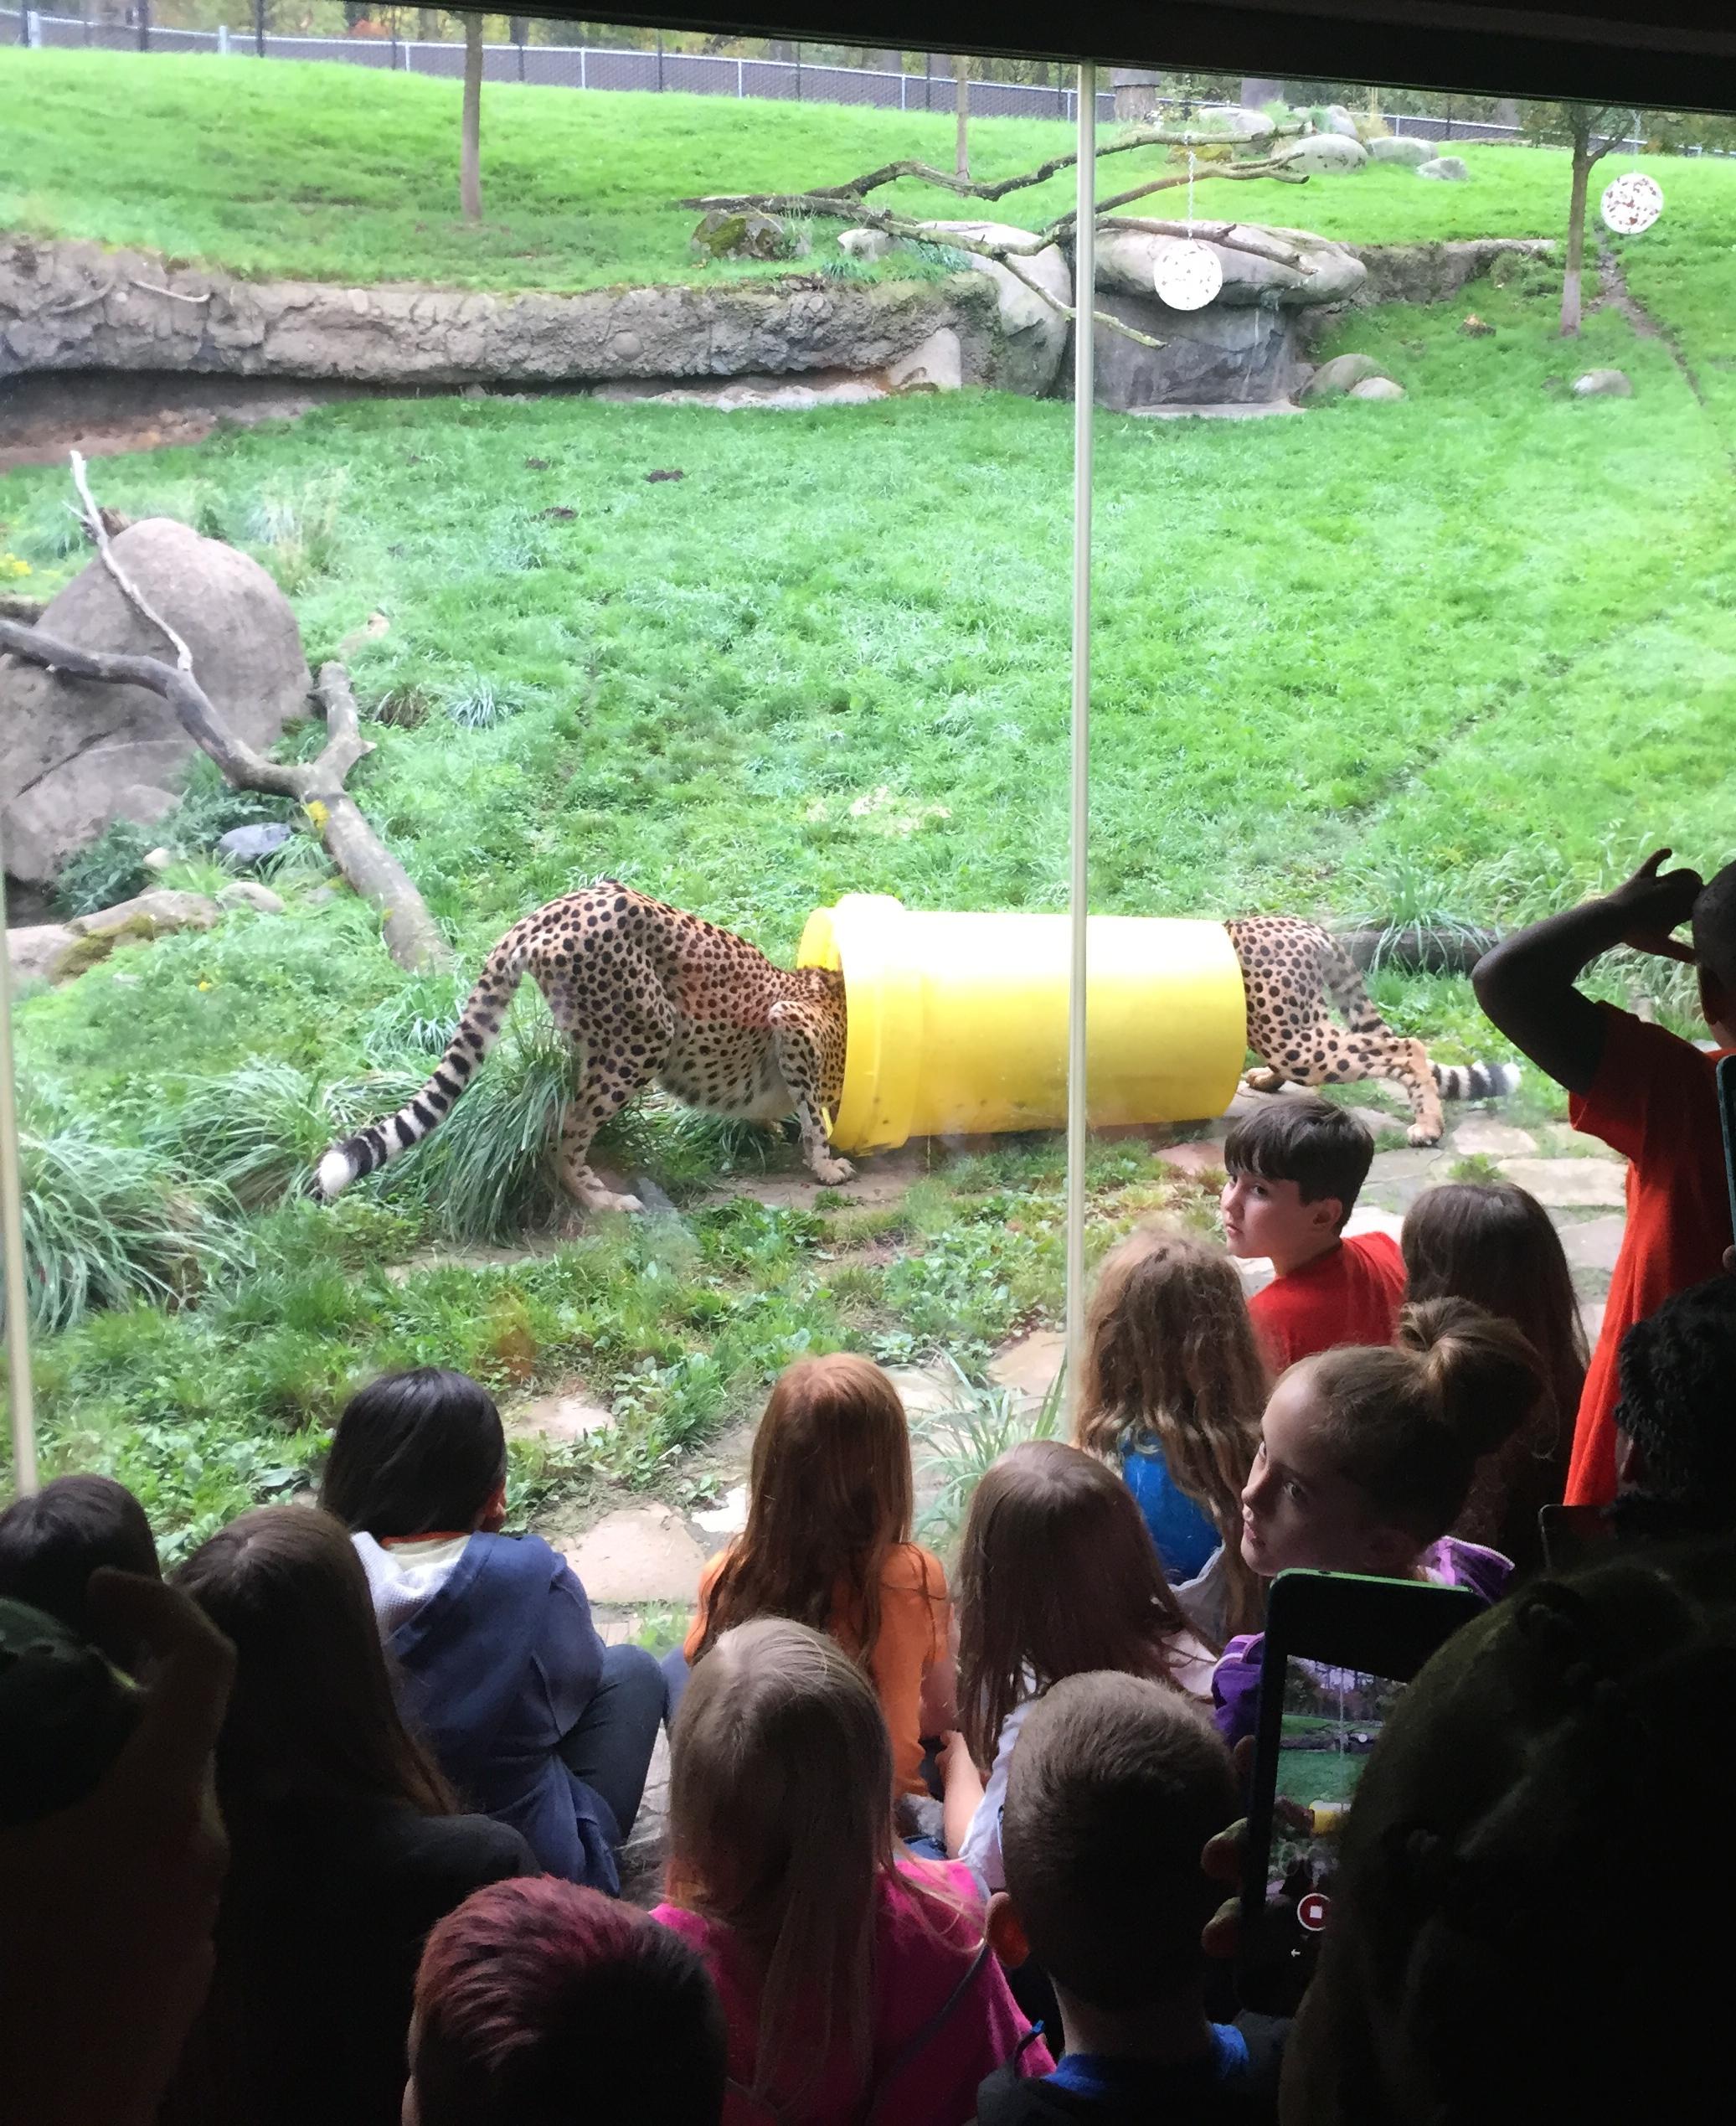 Cheetahs receive breakfast through enriching food challenge.